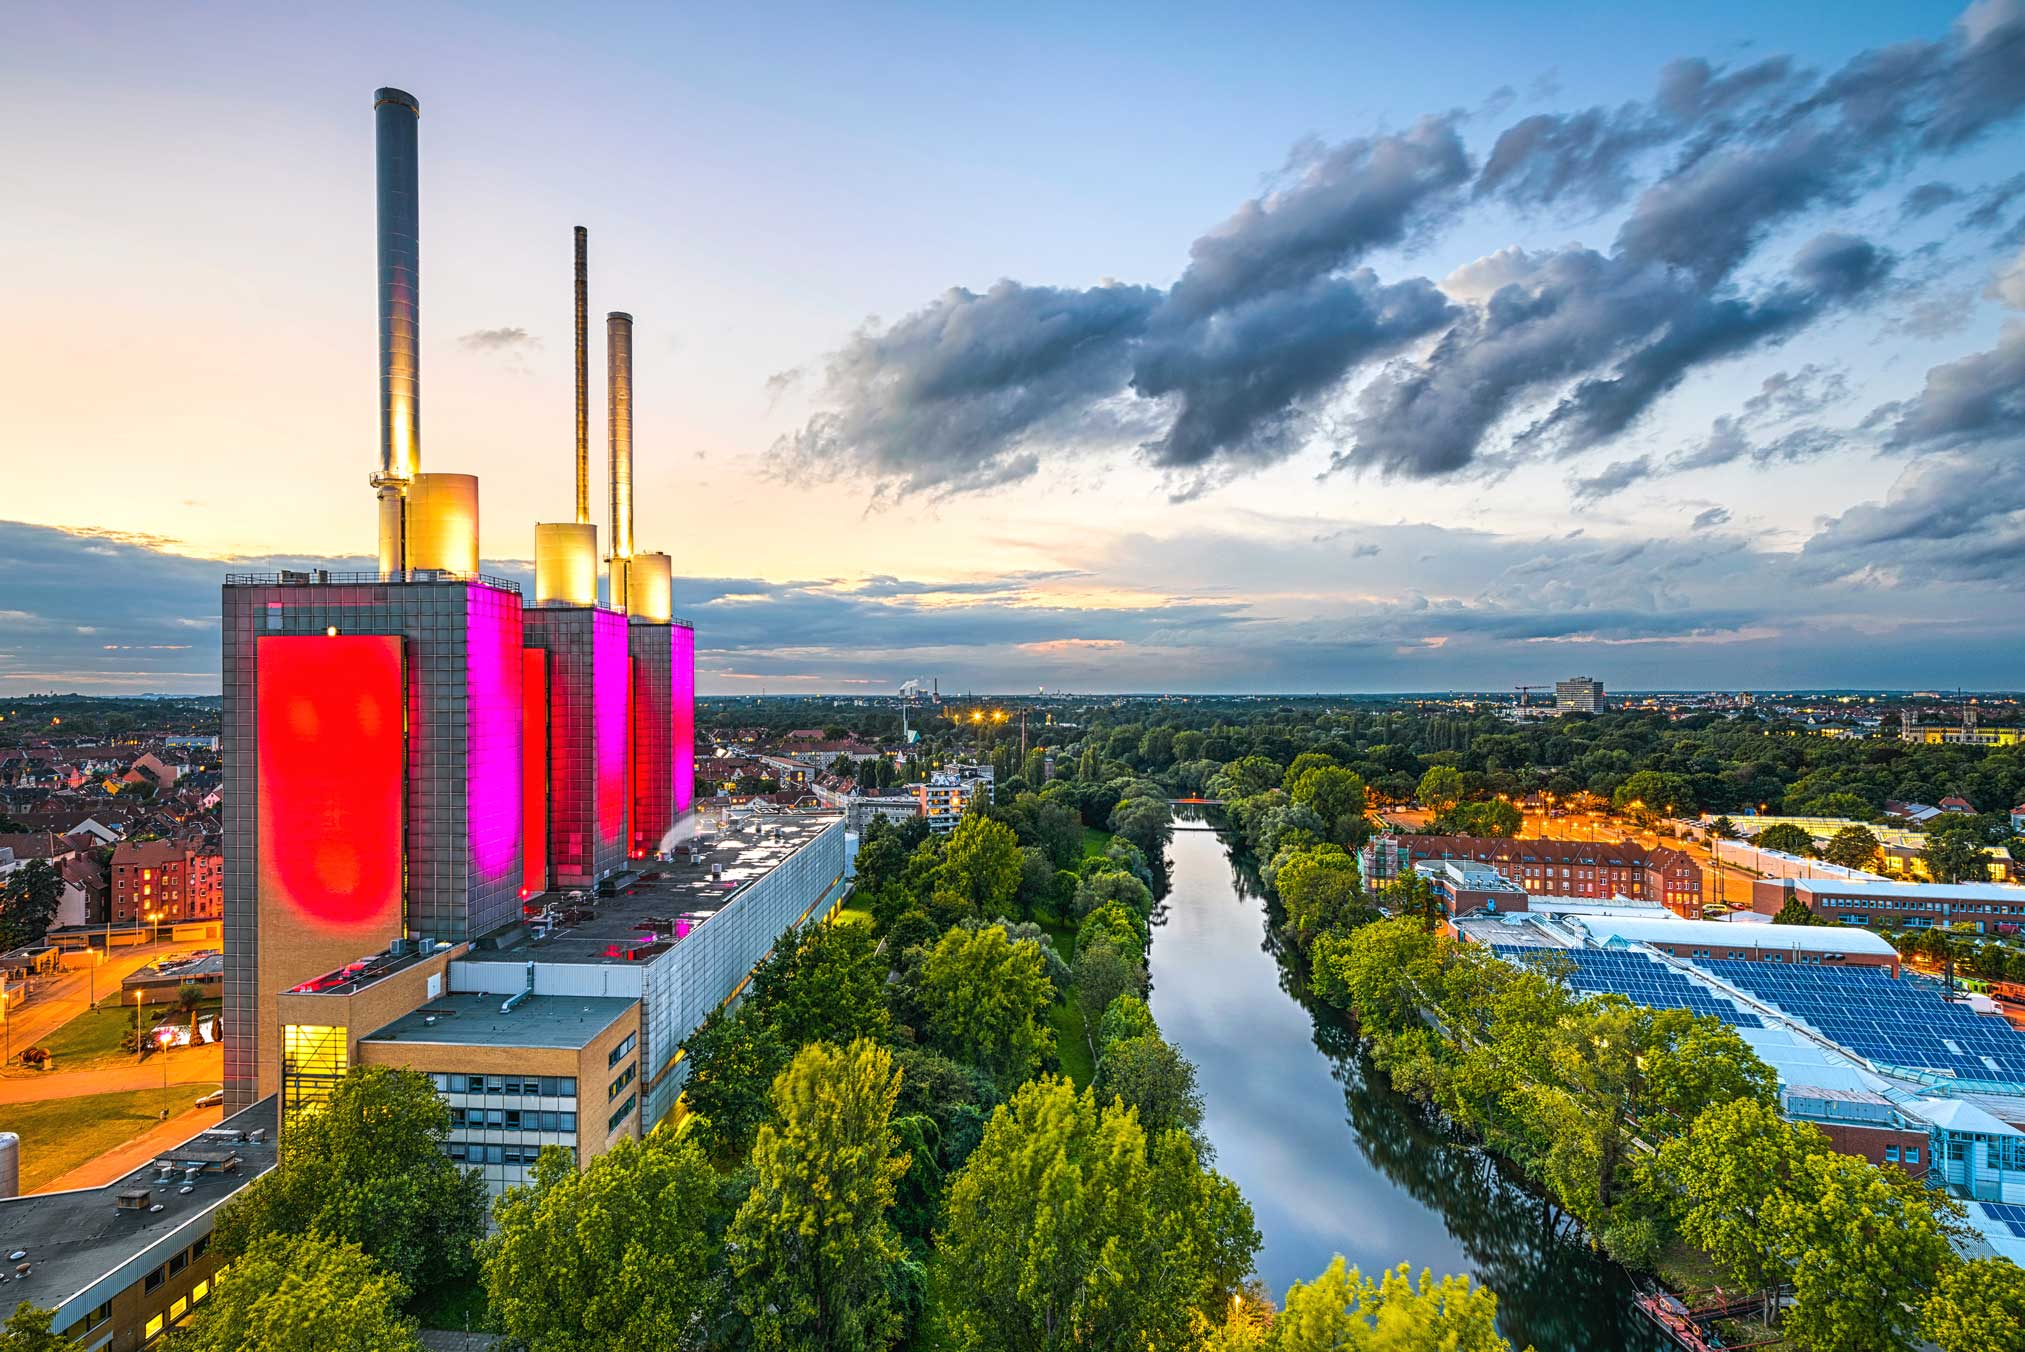 Hanover Trade Fair Capital Of Lower Saxony Prologis Germany